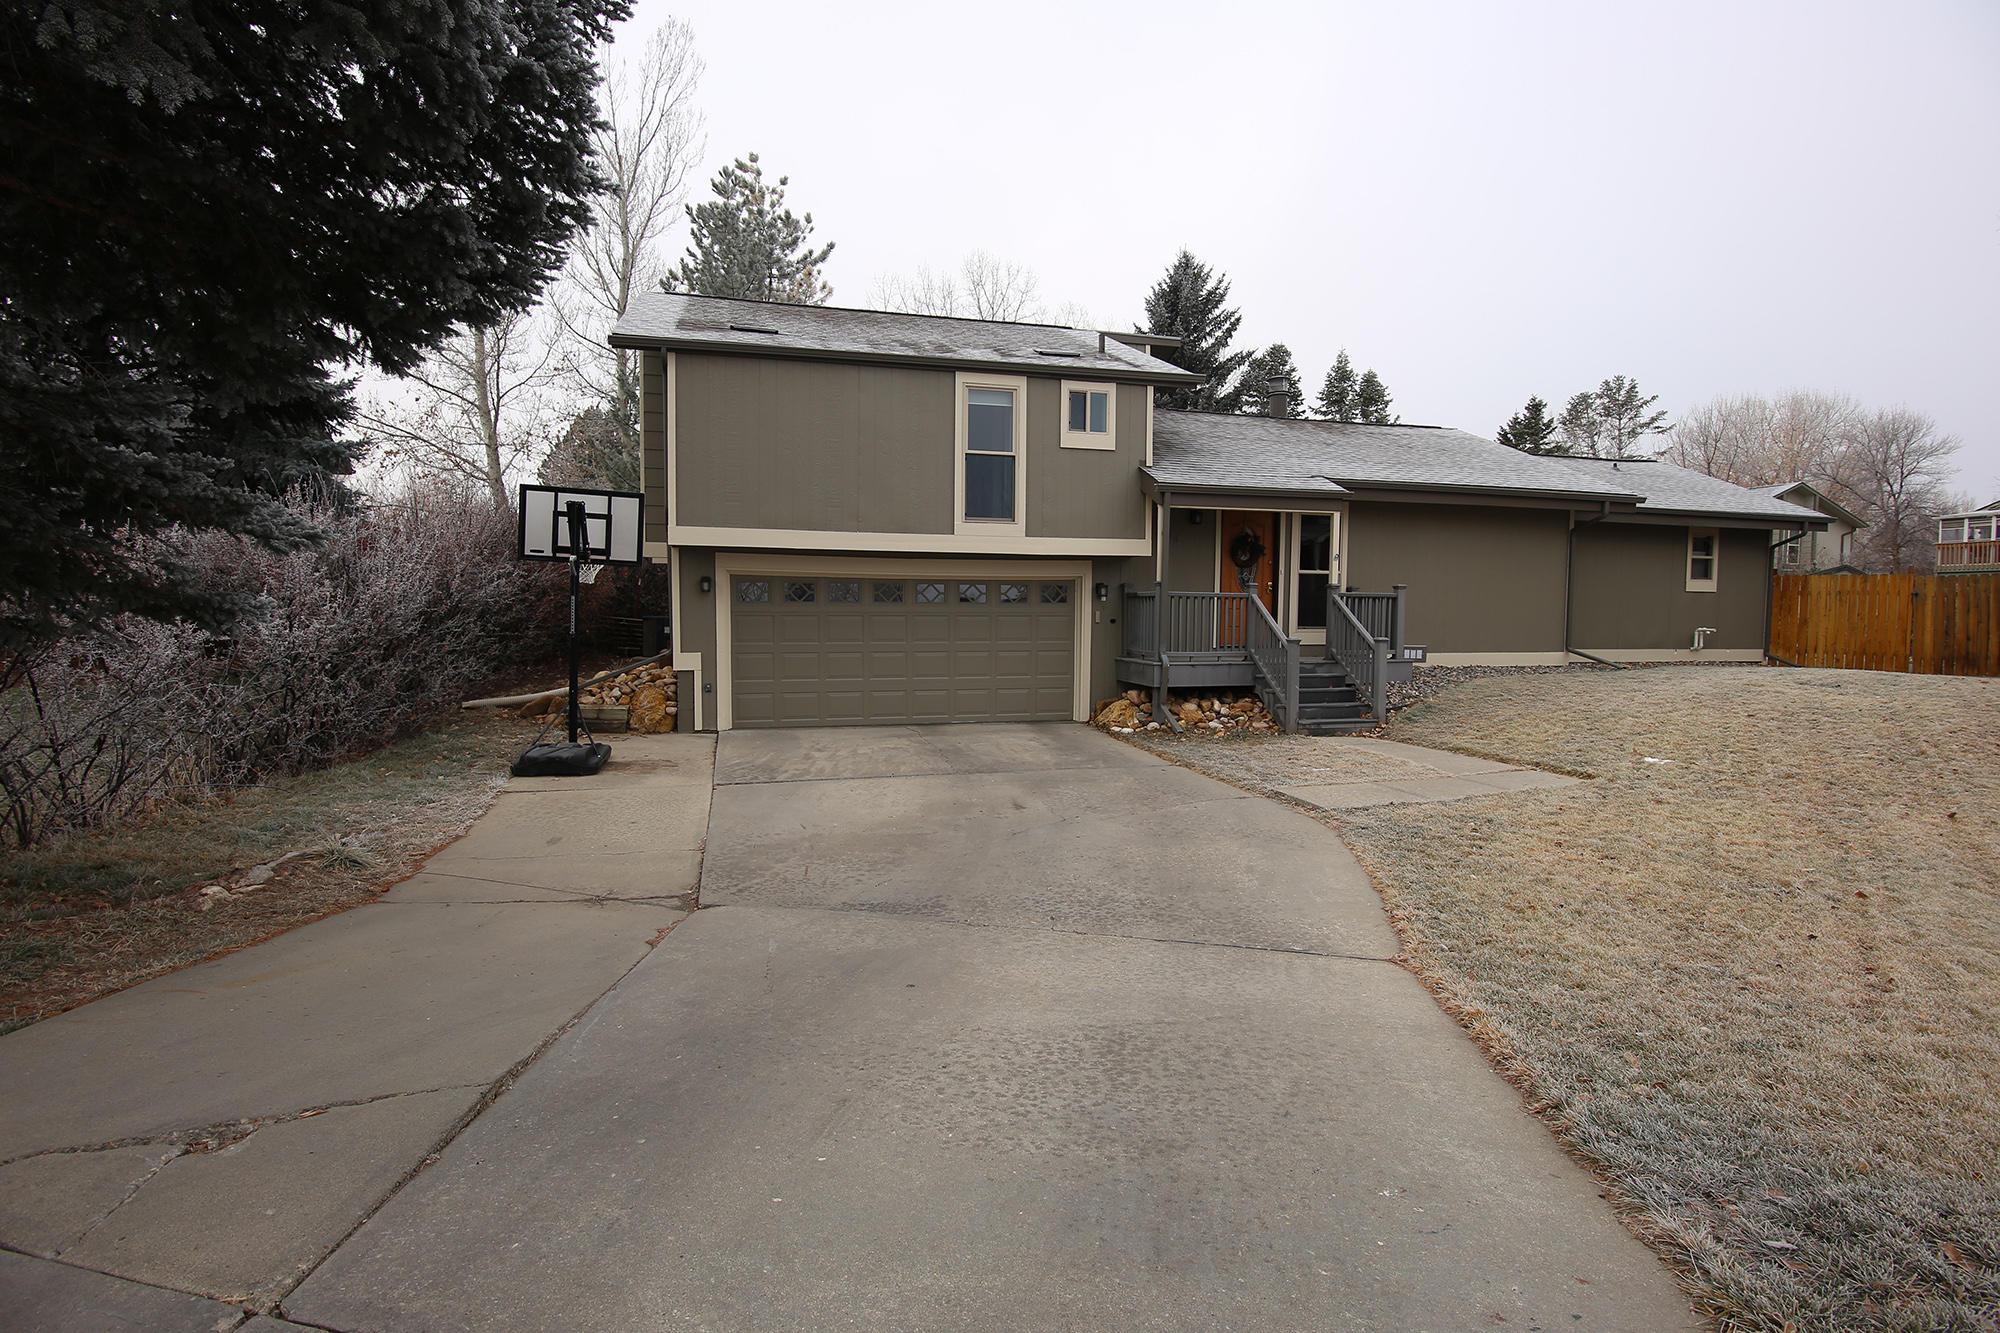 314 Pheasant Place, Sheridan, Wyoming 82801, 3 Bedrooms Bedrooms, ,1.75 BathroomsBathrooms,Residential,For Sale,Pheasant,20-1191